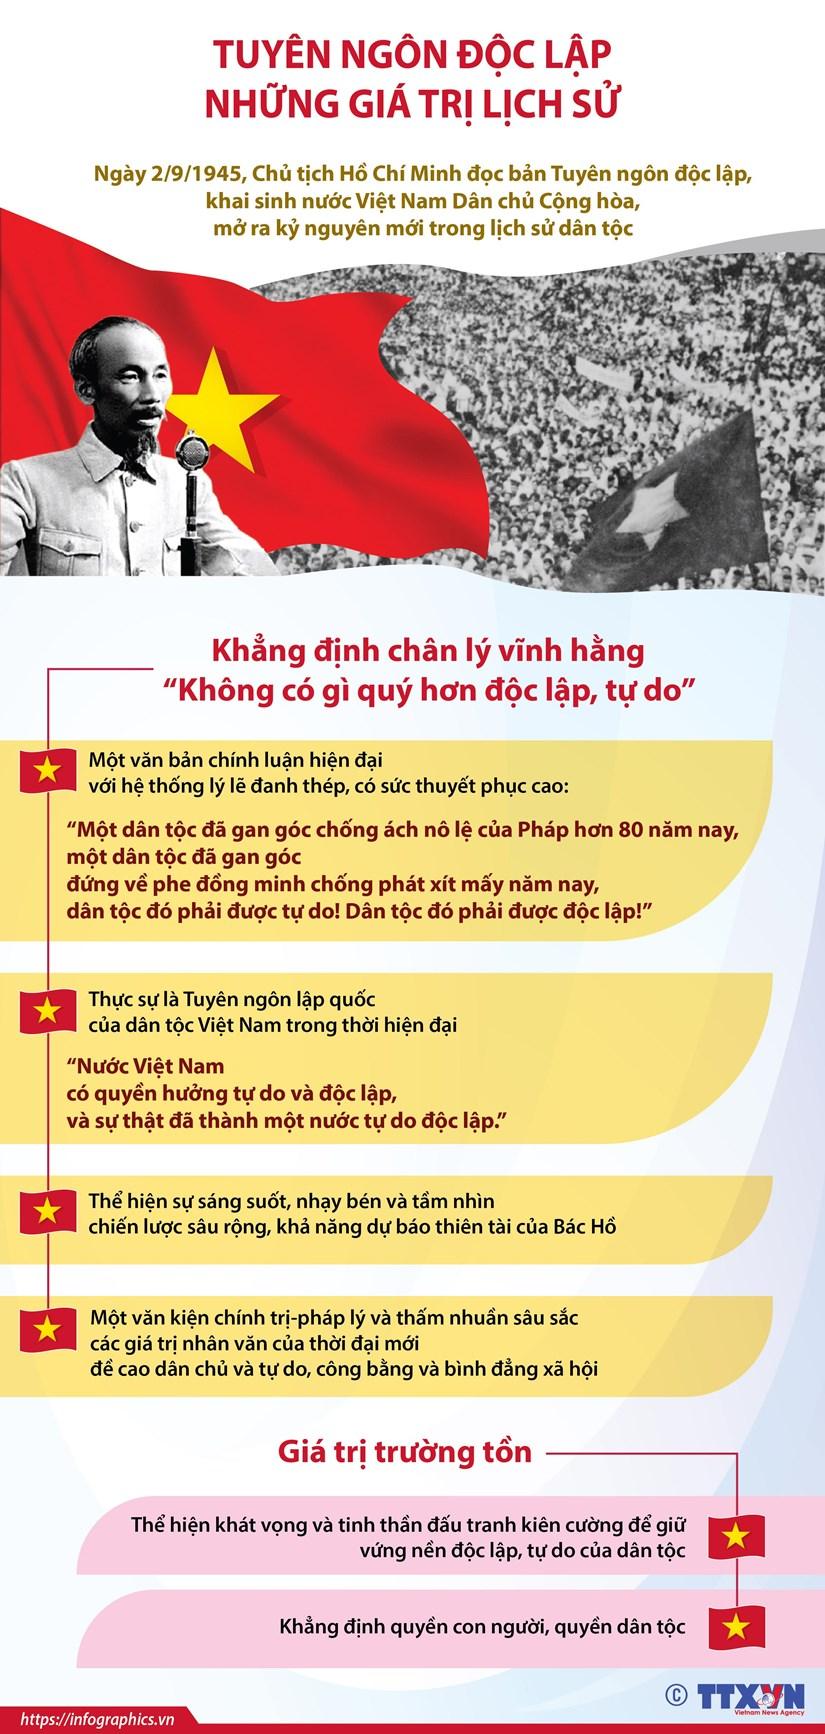 [Infographics] Tuyen ngon doc lap - Nhung gia tri lich su hinh anh 1